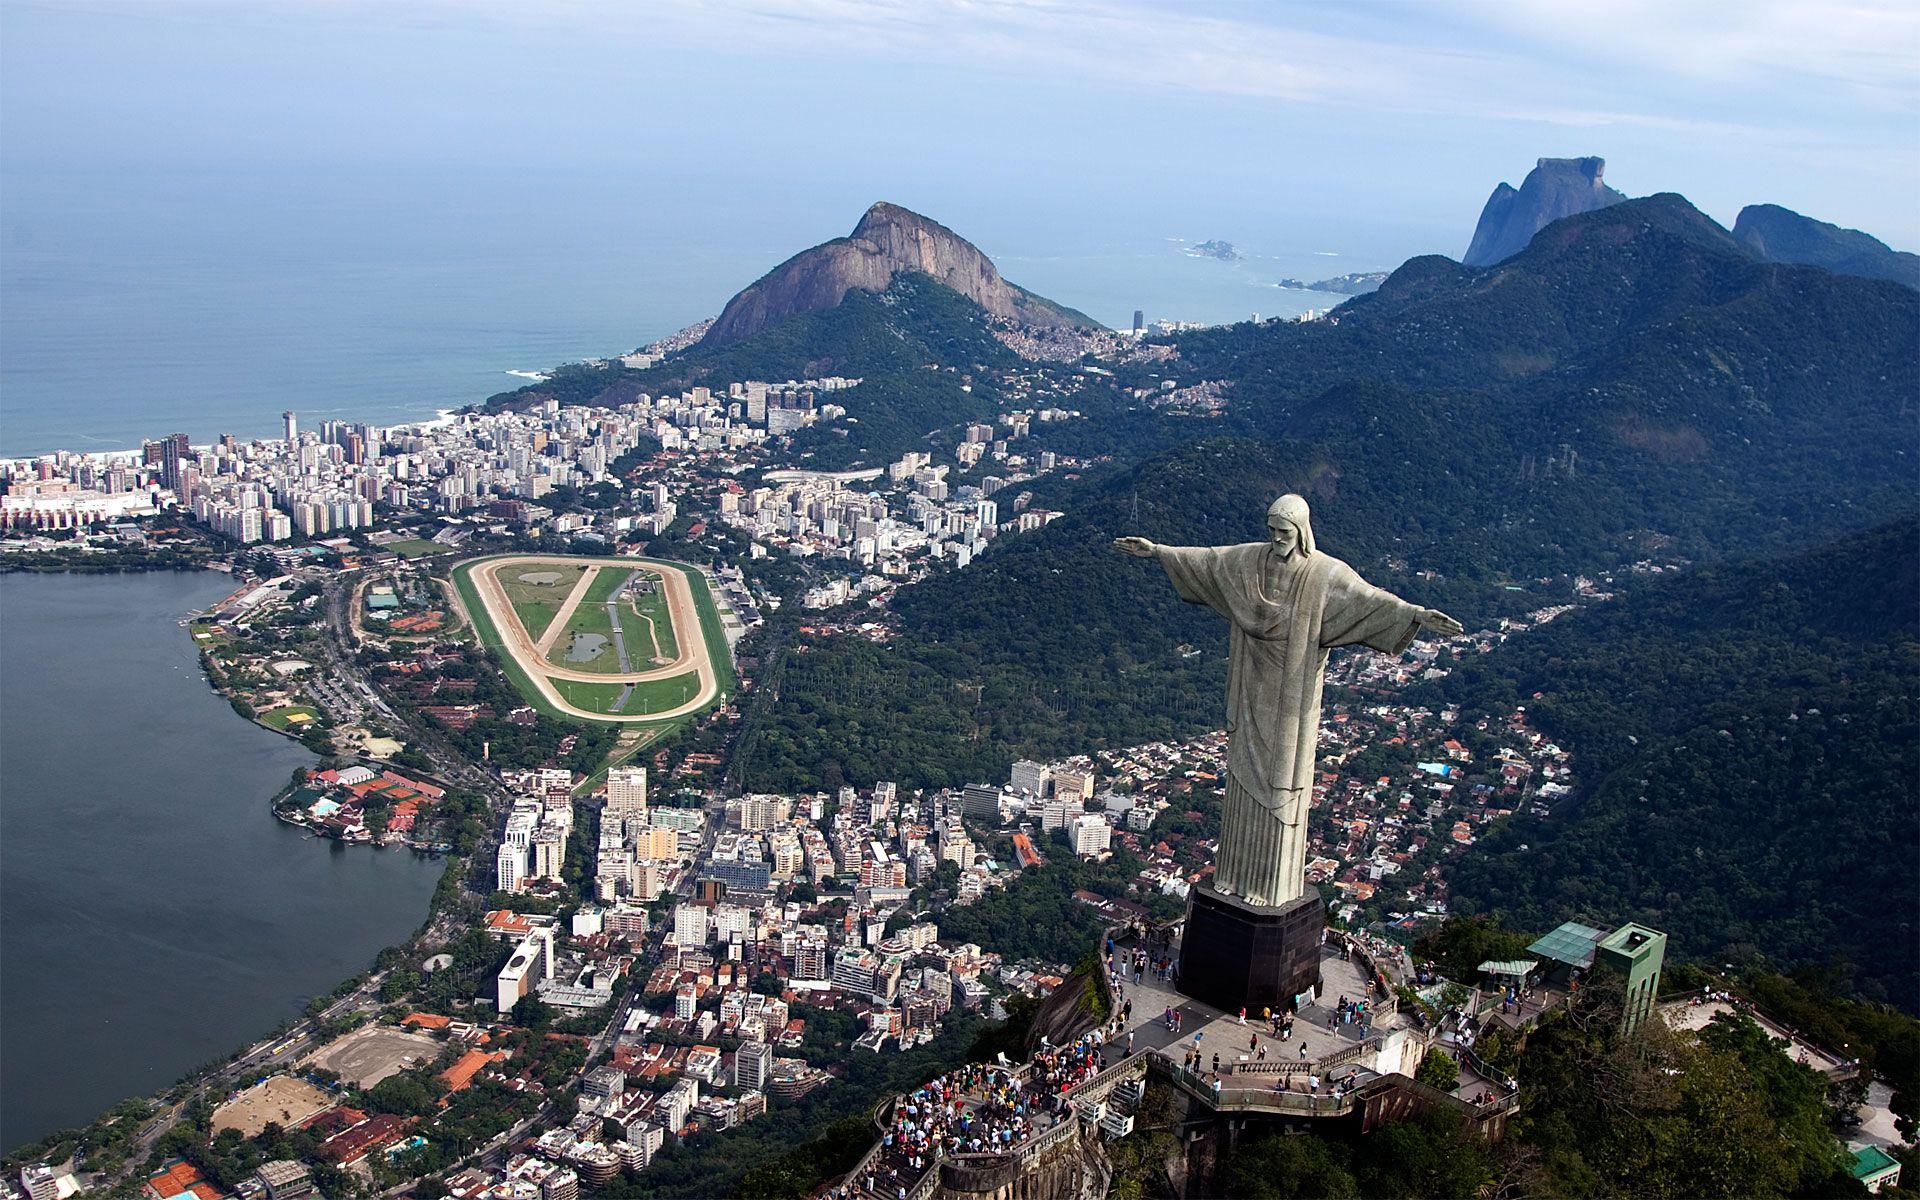 Google Image Result For Http Tommo39 Files Wordpress Com 2010 12 32brazil020r Brazil Cities Brazil Wallpaper Rio De Janeiro